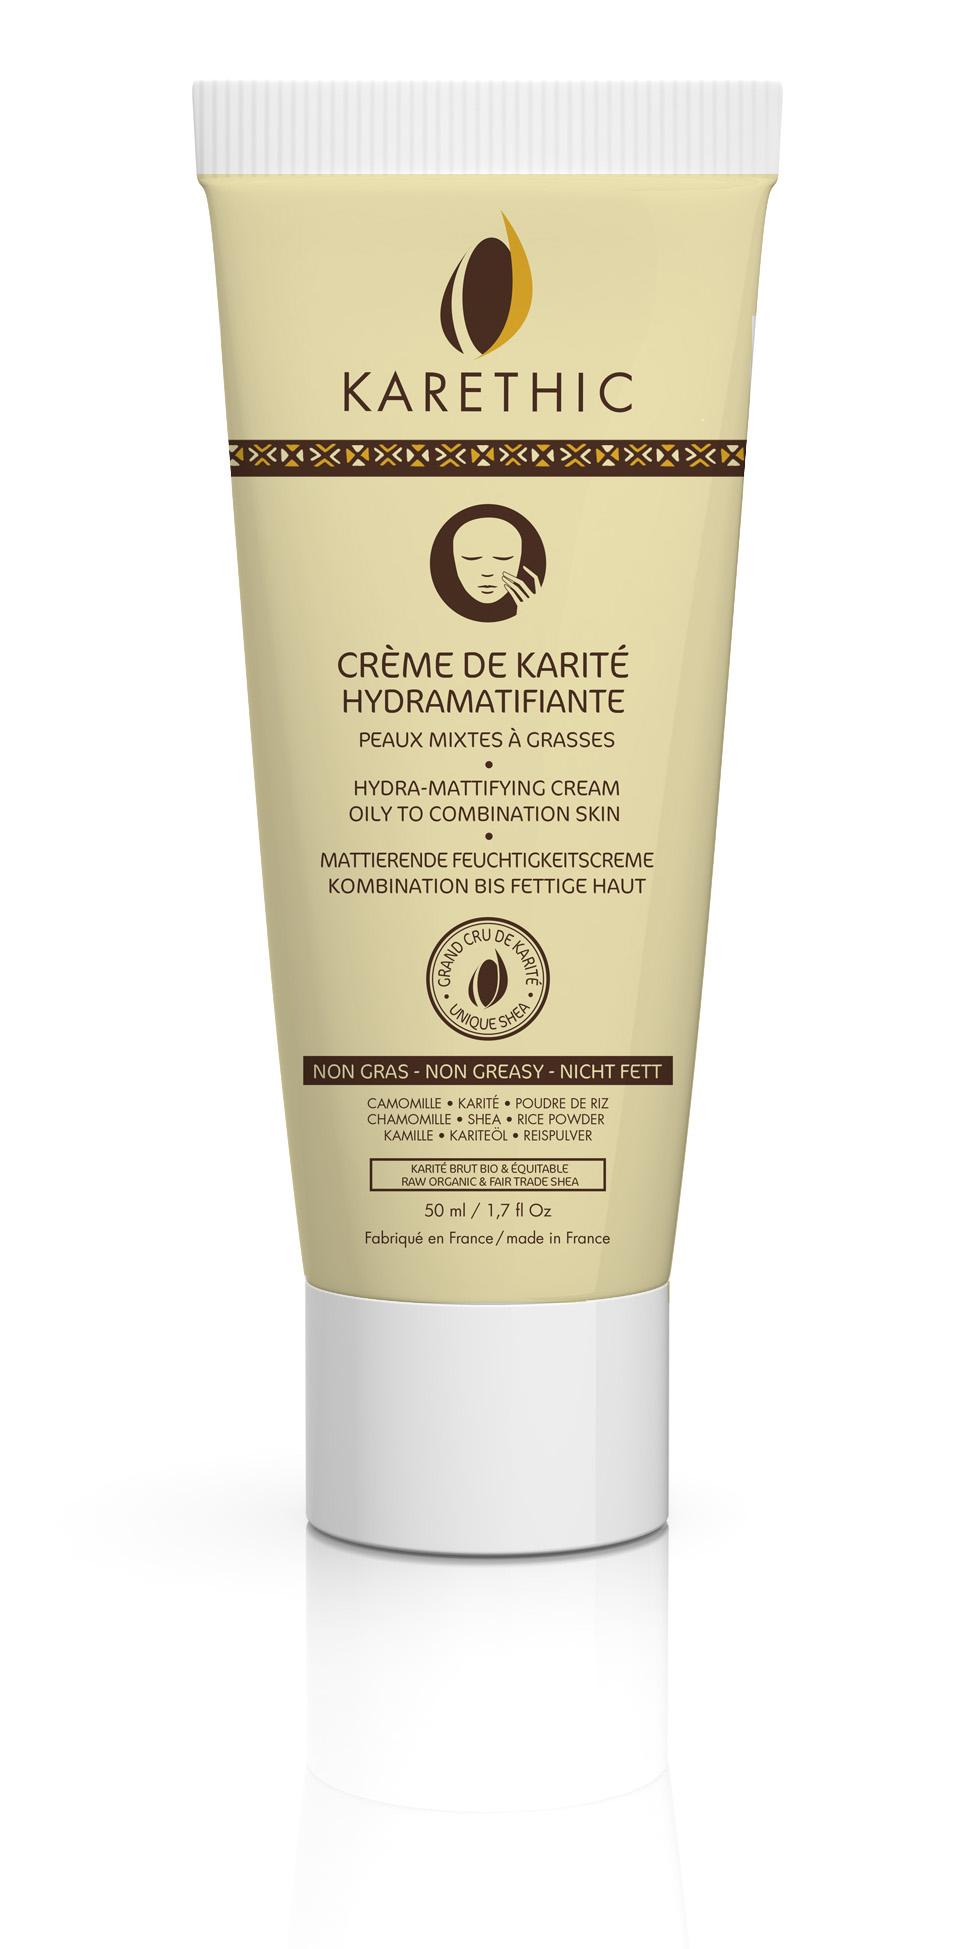 KARETHIC - Crème Hydramatifiante